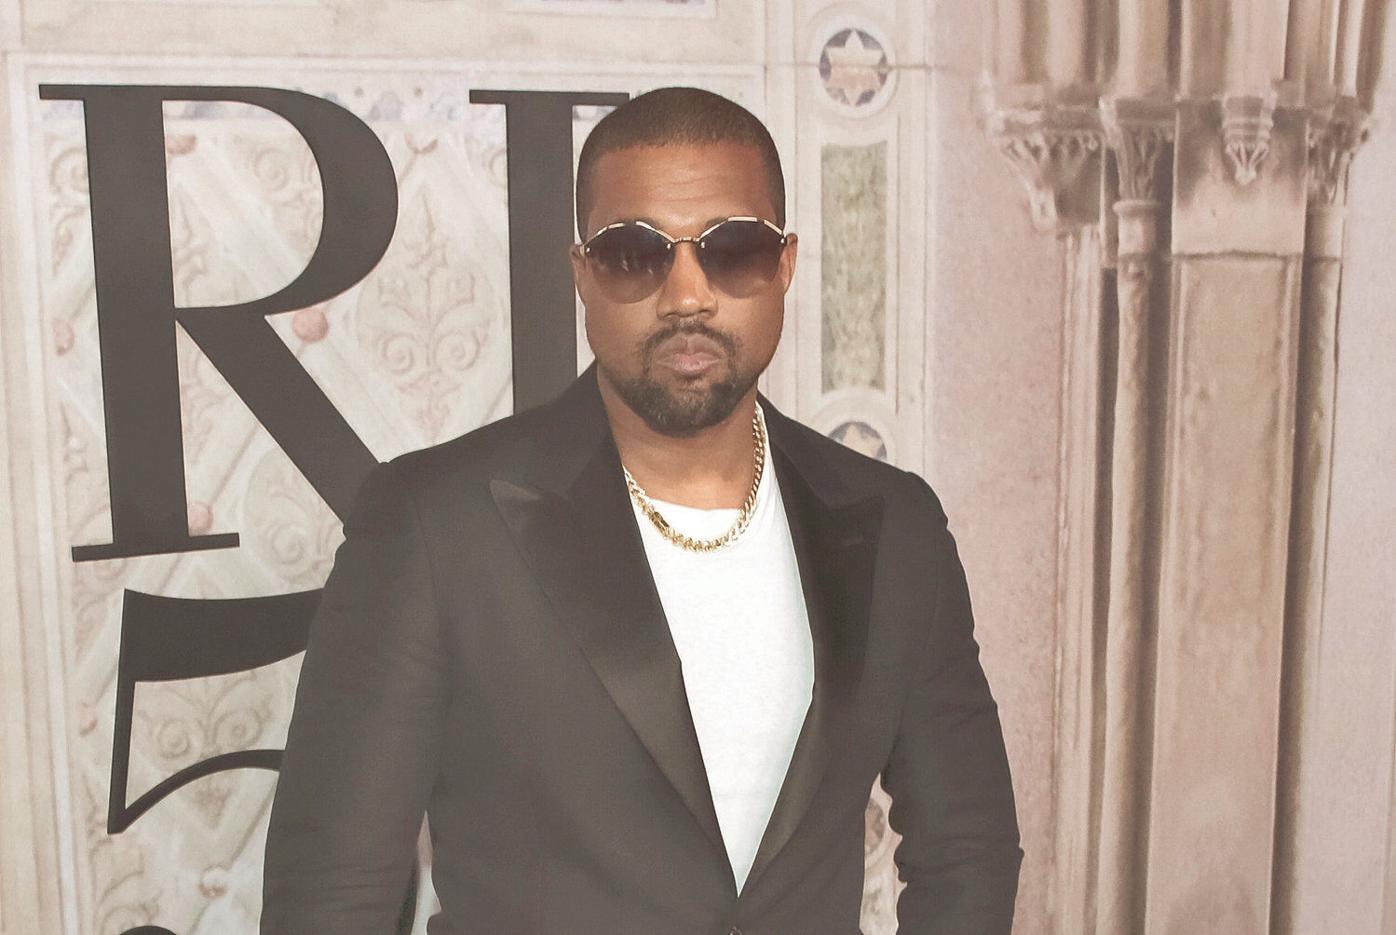 Kanye, Tyler the Creator get personal tour at Mass MoCA